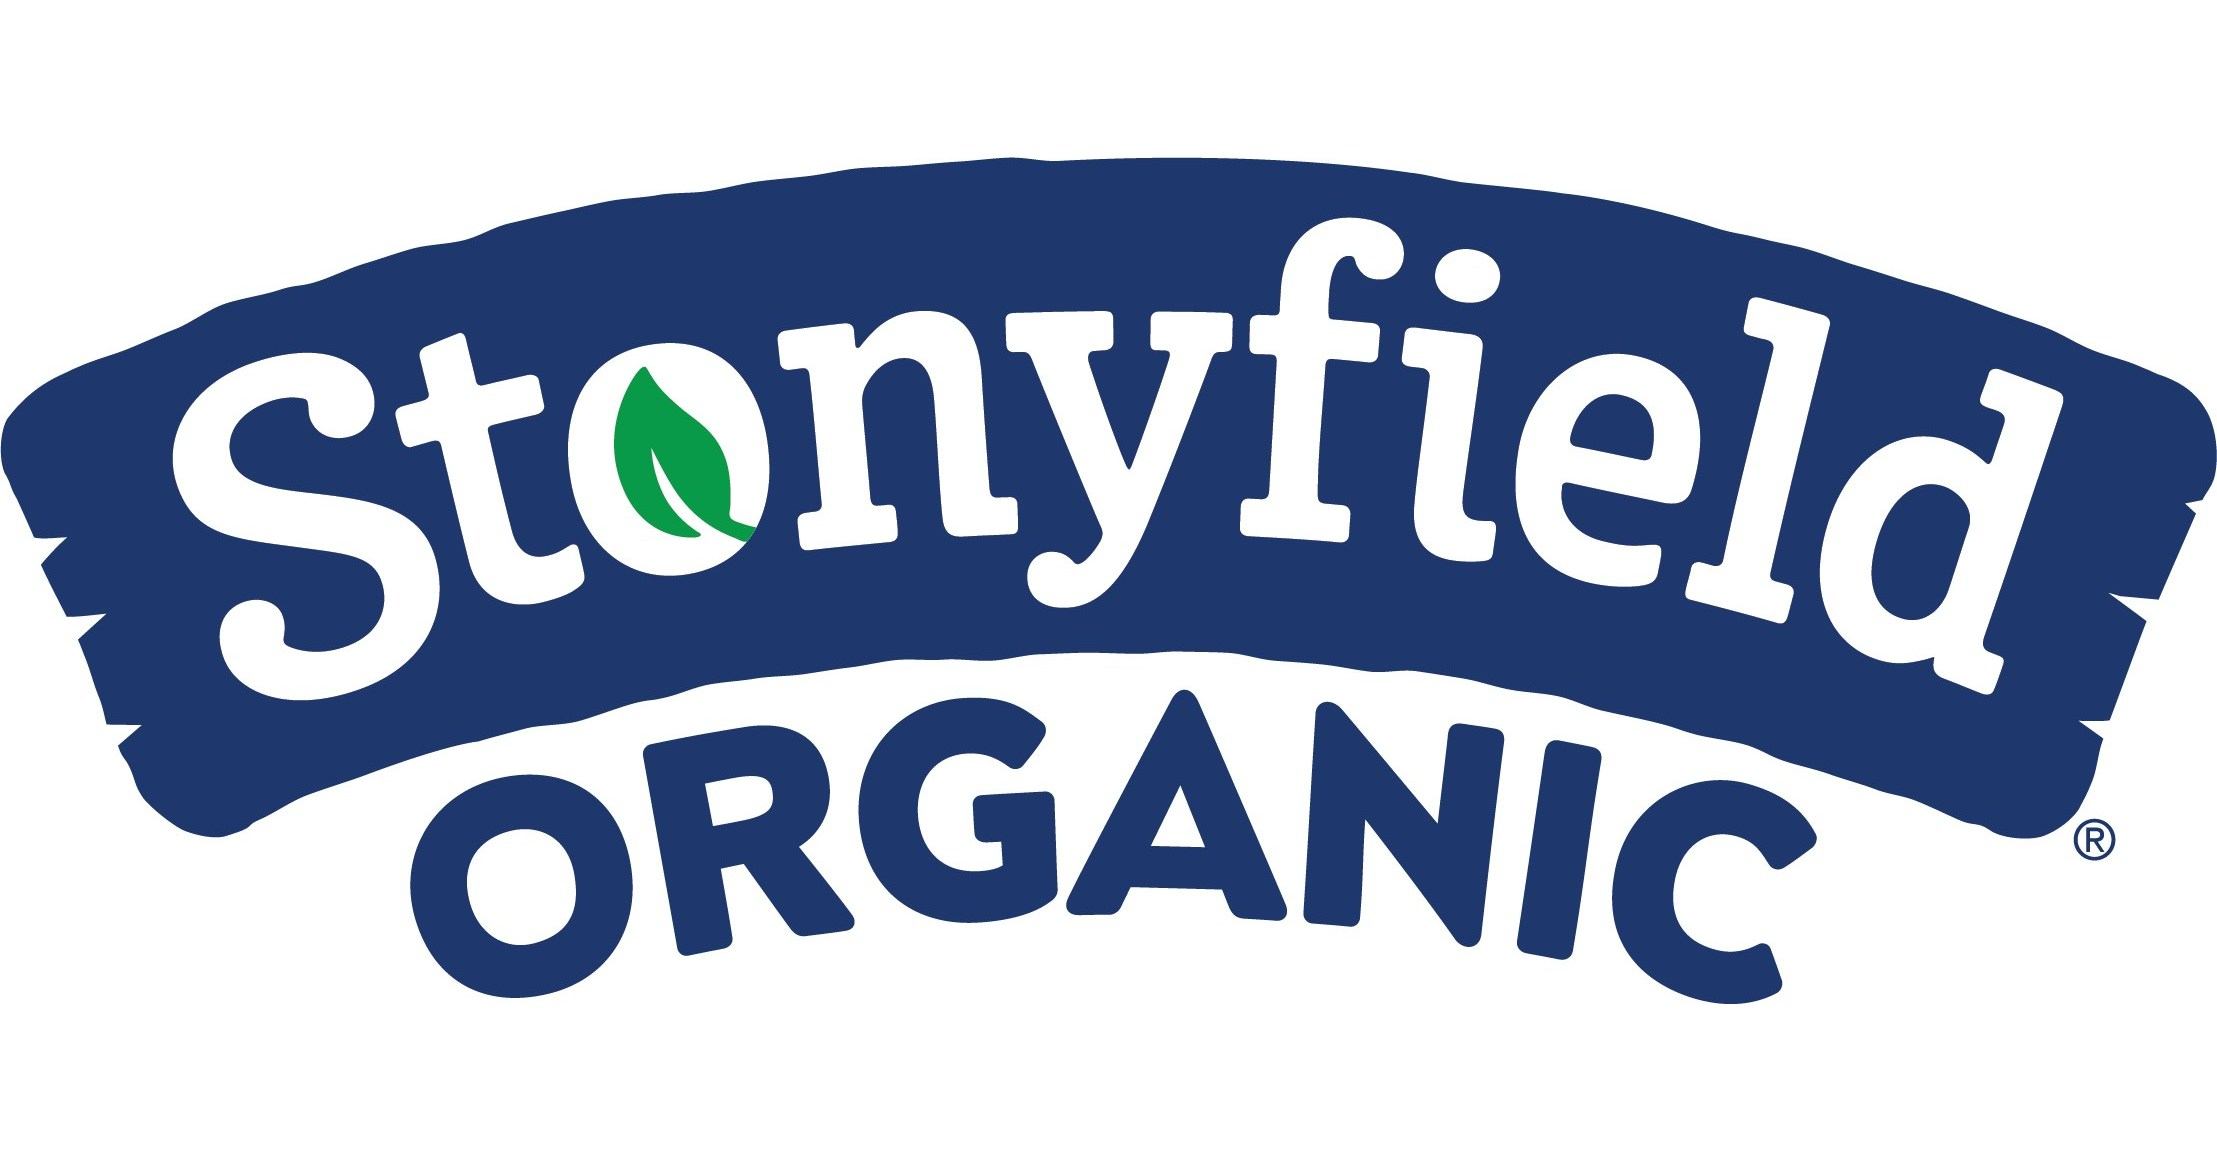 Stonyfield Organic Yogurt Introduces The First Organic Daily Probiotic Yogurt Drink On The Market photo